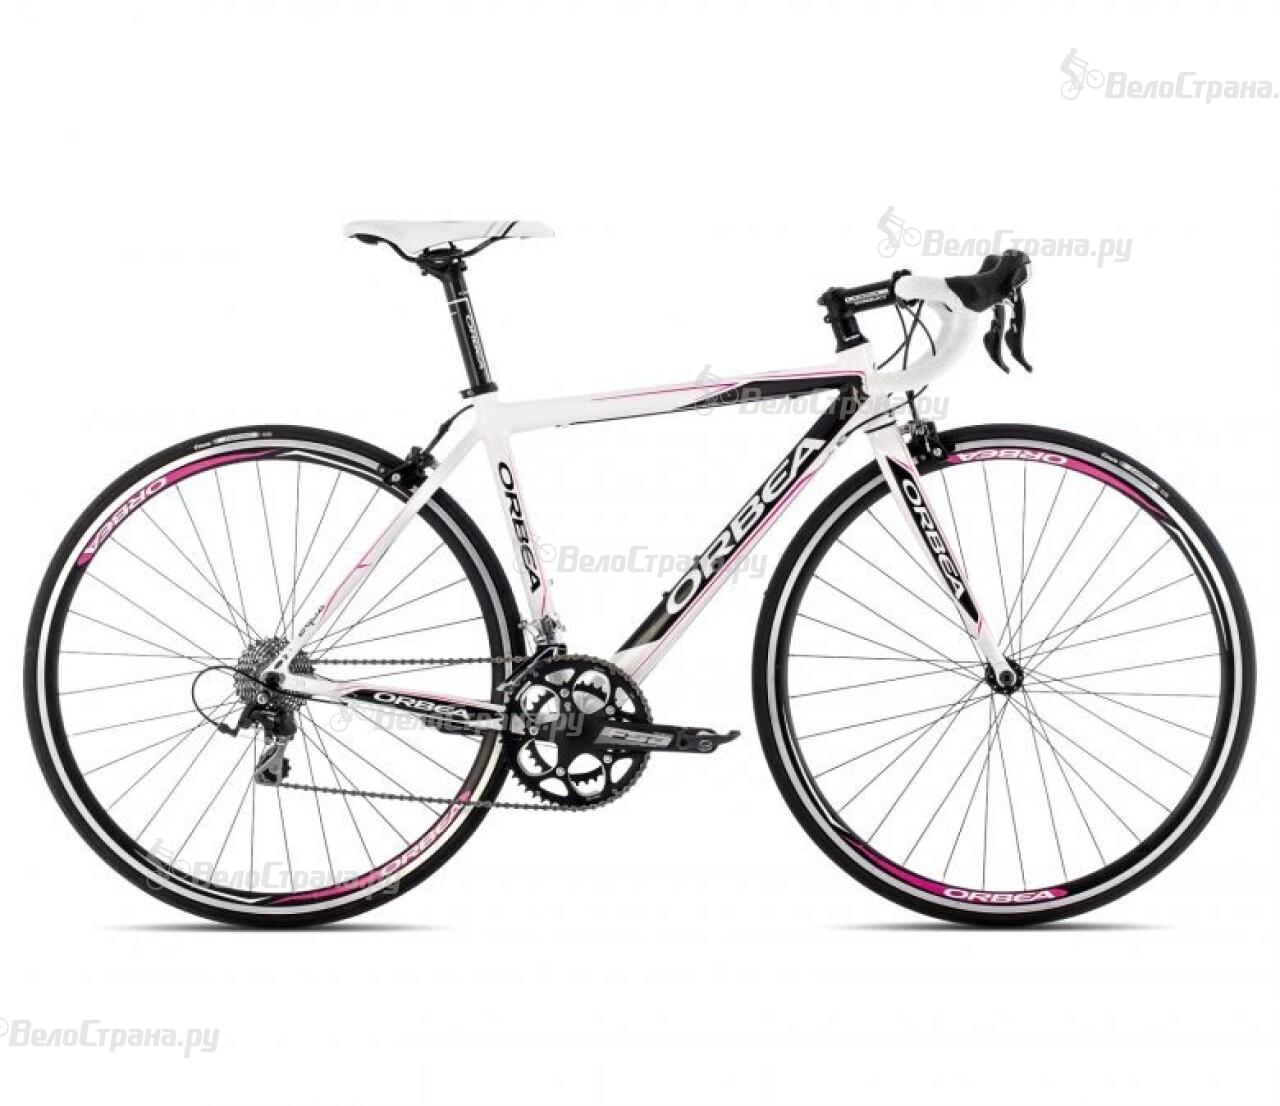 Велосипед Orbea Aqua Dama 10 (2014) велосипед orbea aqua t23 2013